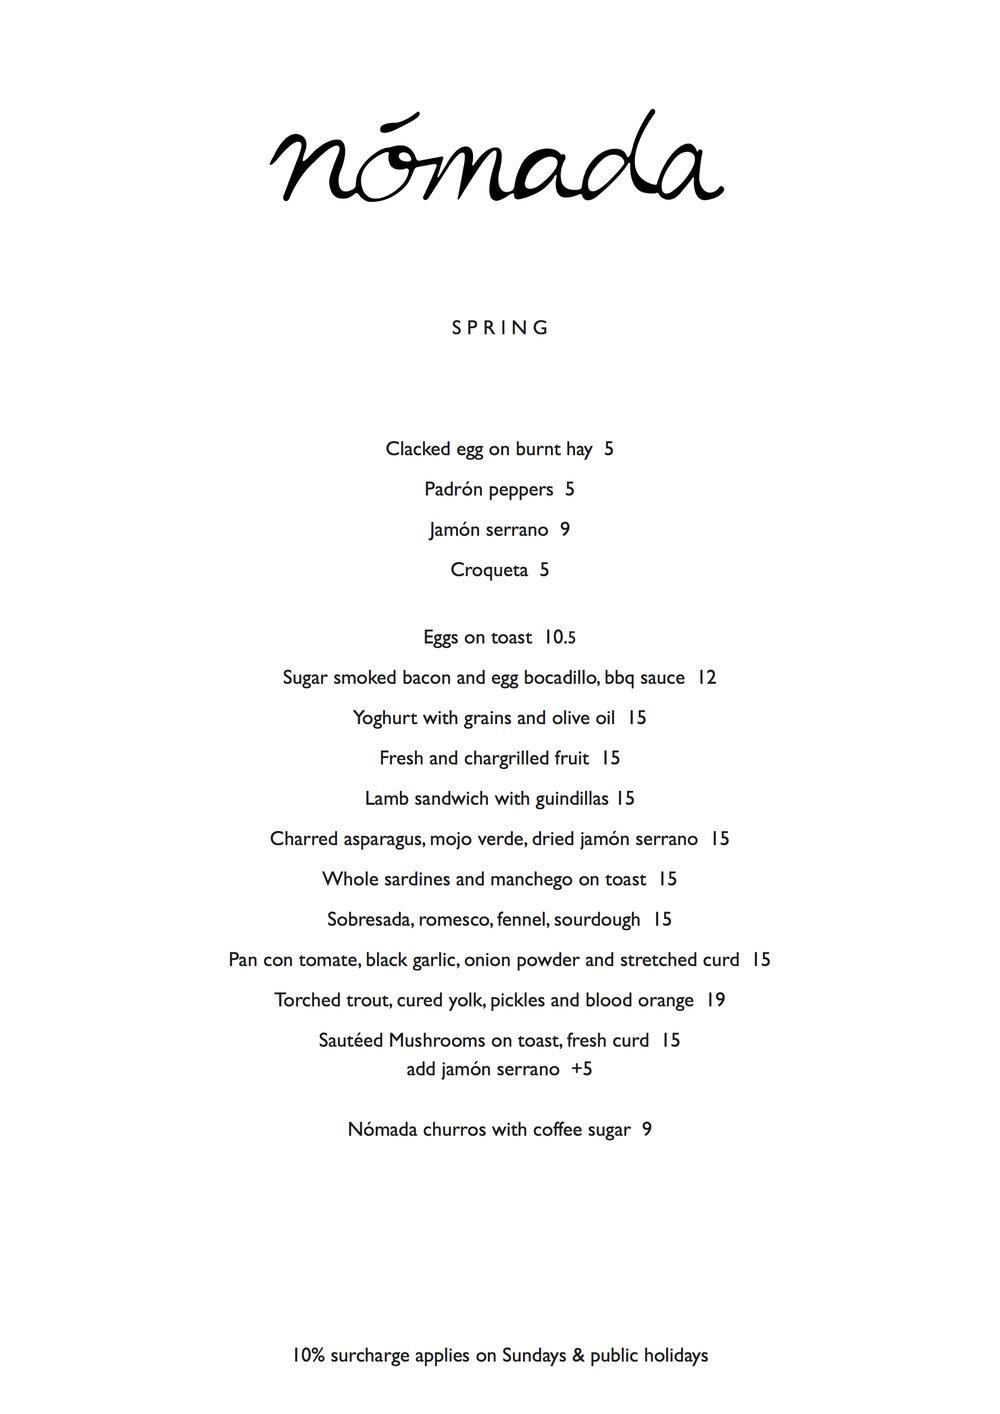 Nomada-Day-Menu-Fitzroy-Tapas-Cafe